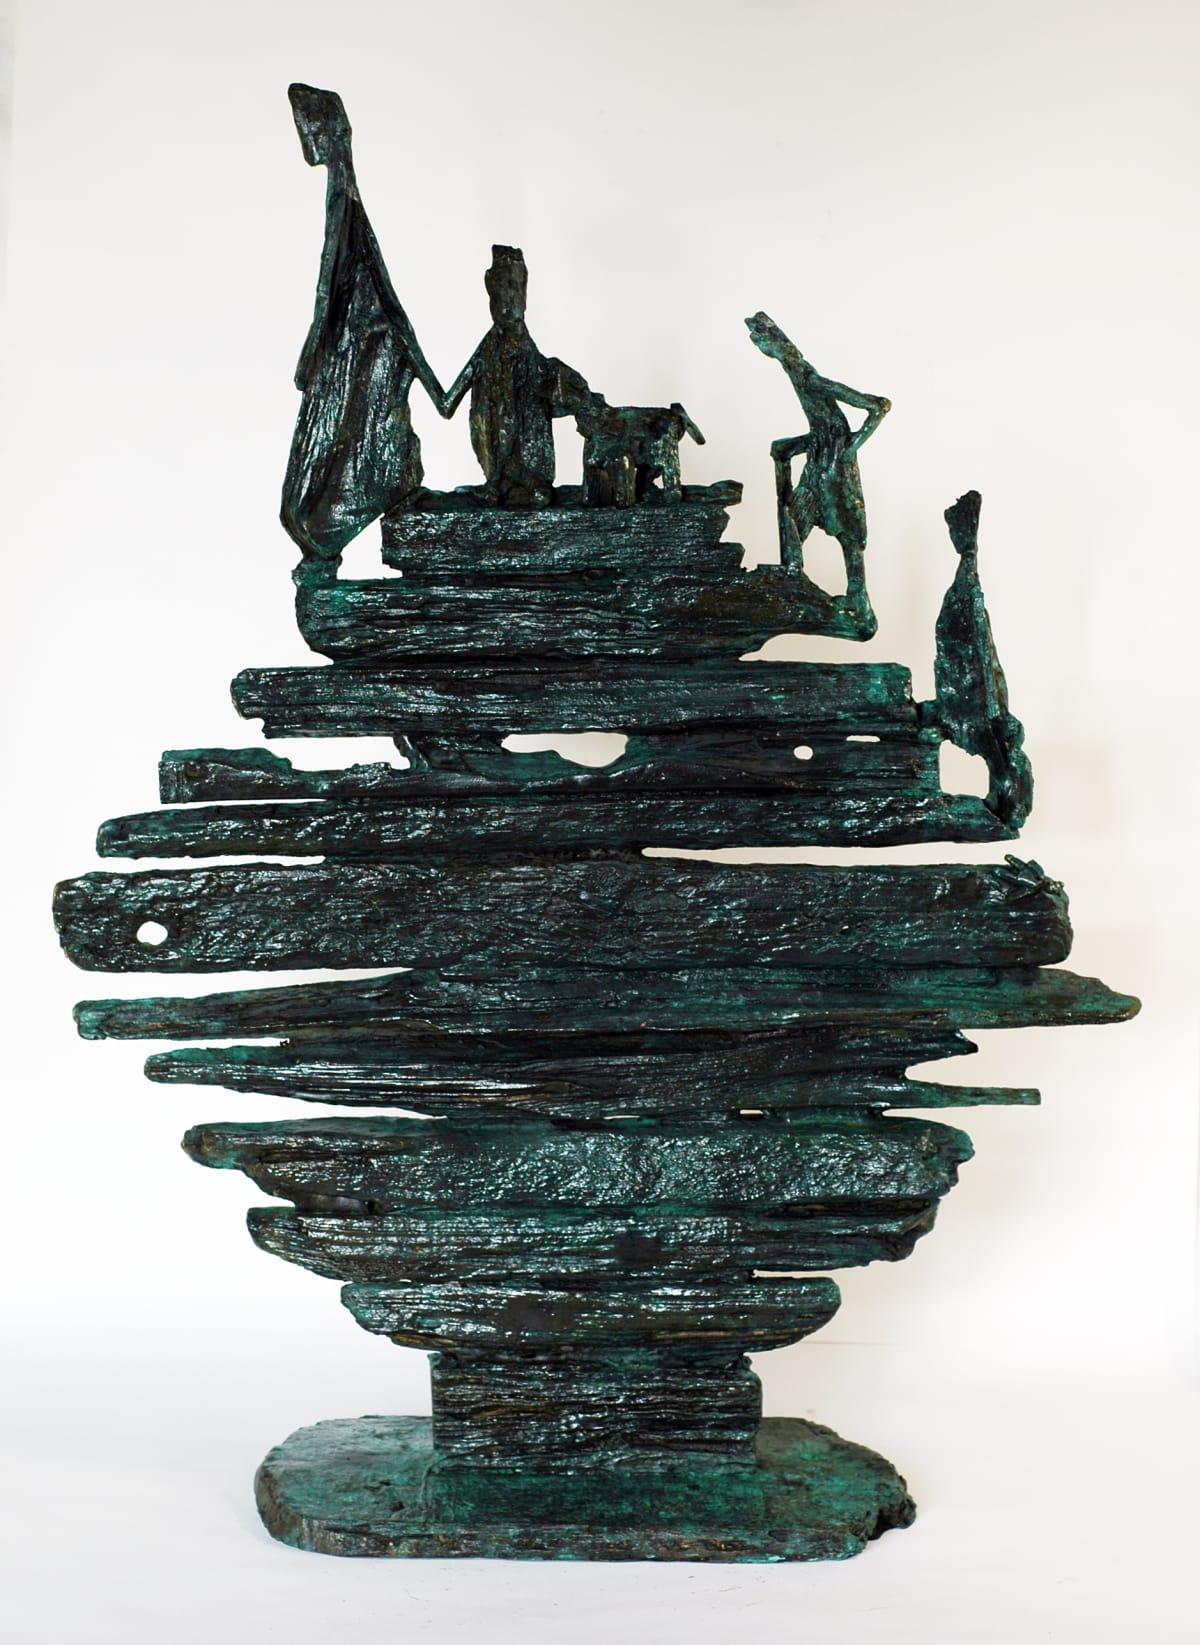 Helen Sinclair The Journey, 2017 Bronze Sculpture 66 x 51 x 19 cm 26 x 20 1/8 x 7 1/2 in Edition 5 of 9